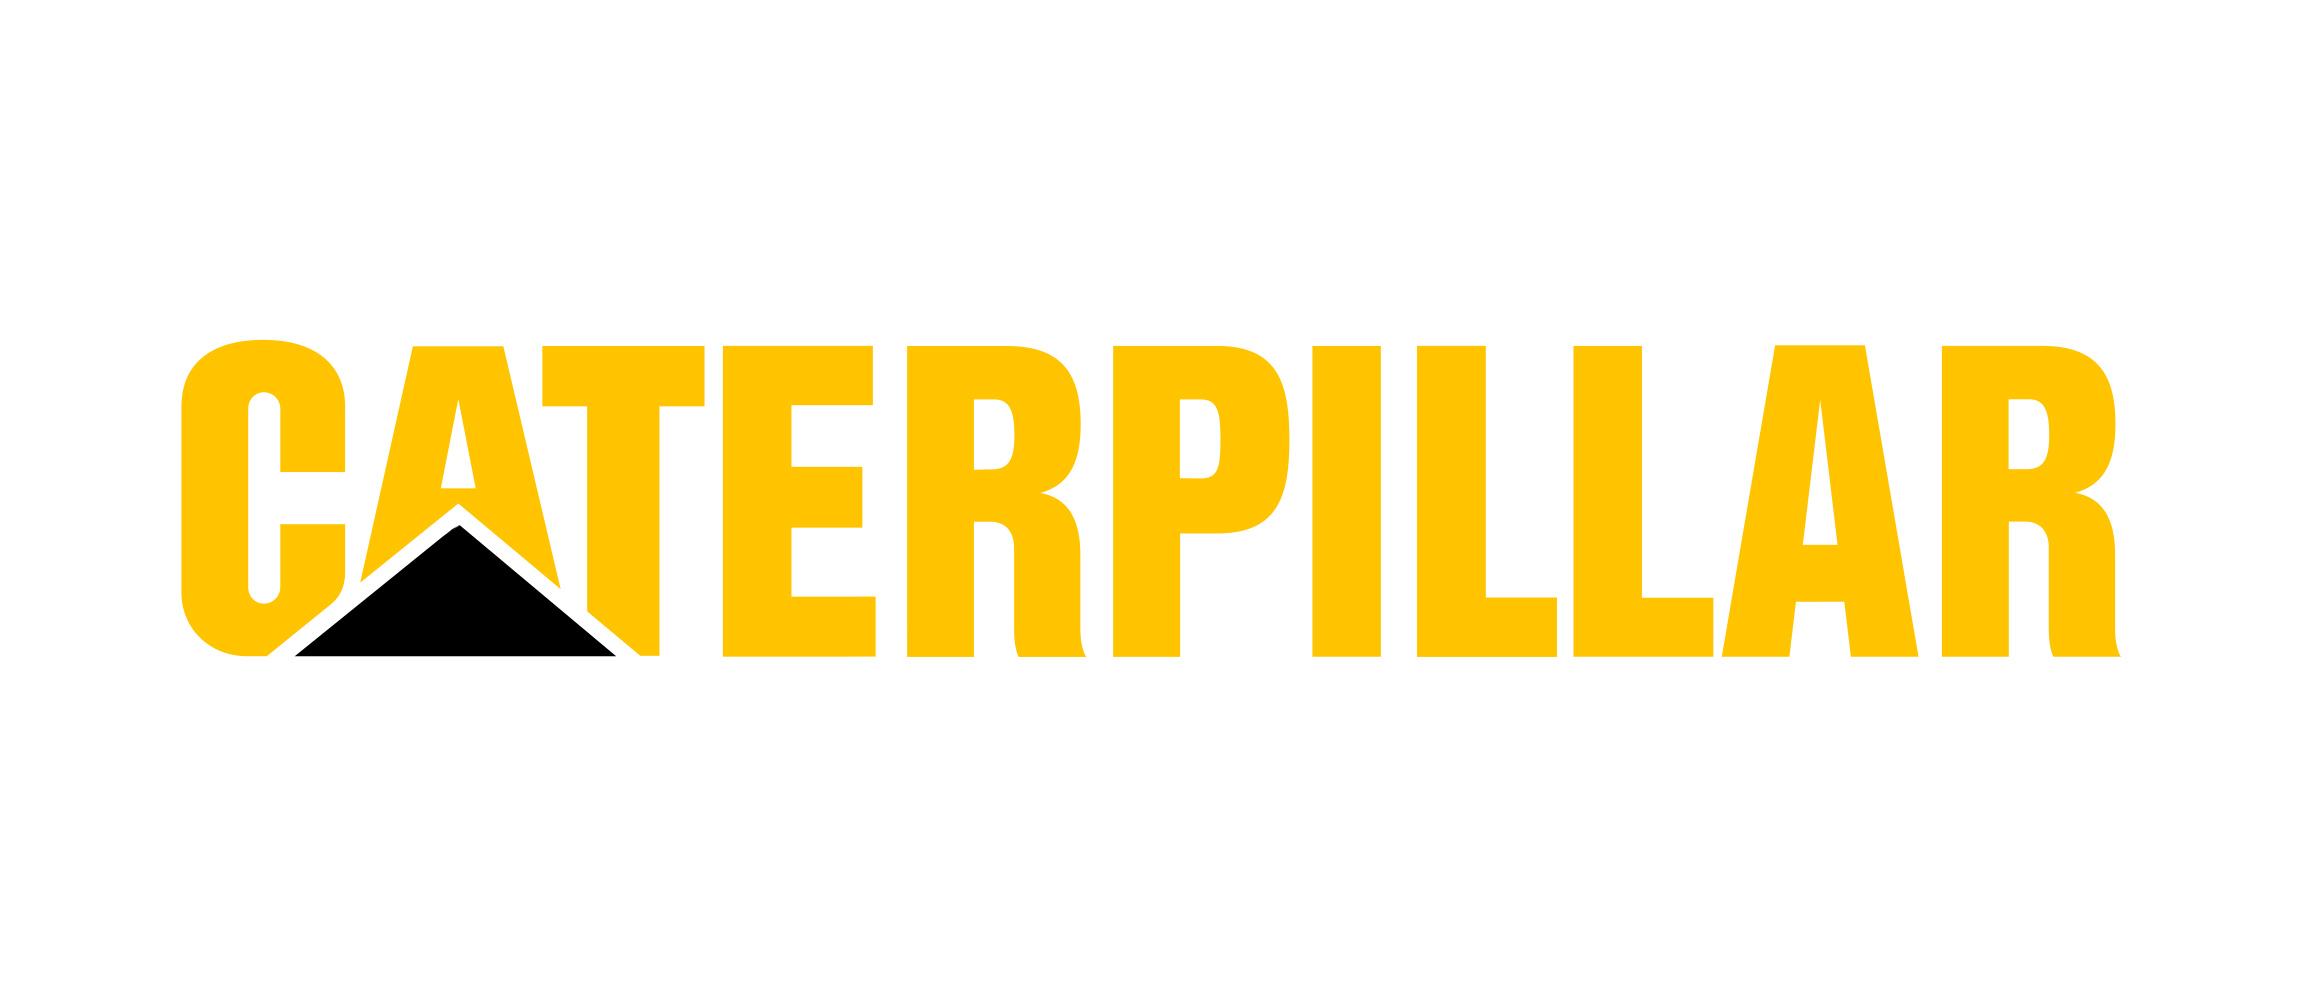 Caterpillar Logo Caterprillar Symbol Meaning History And Evolution